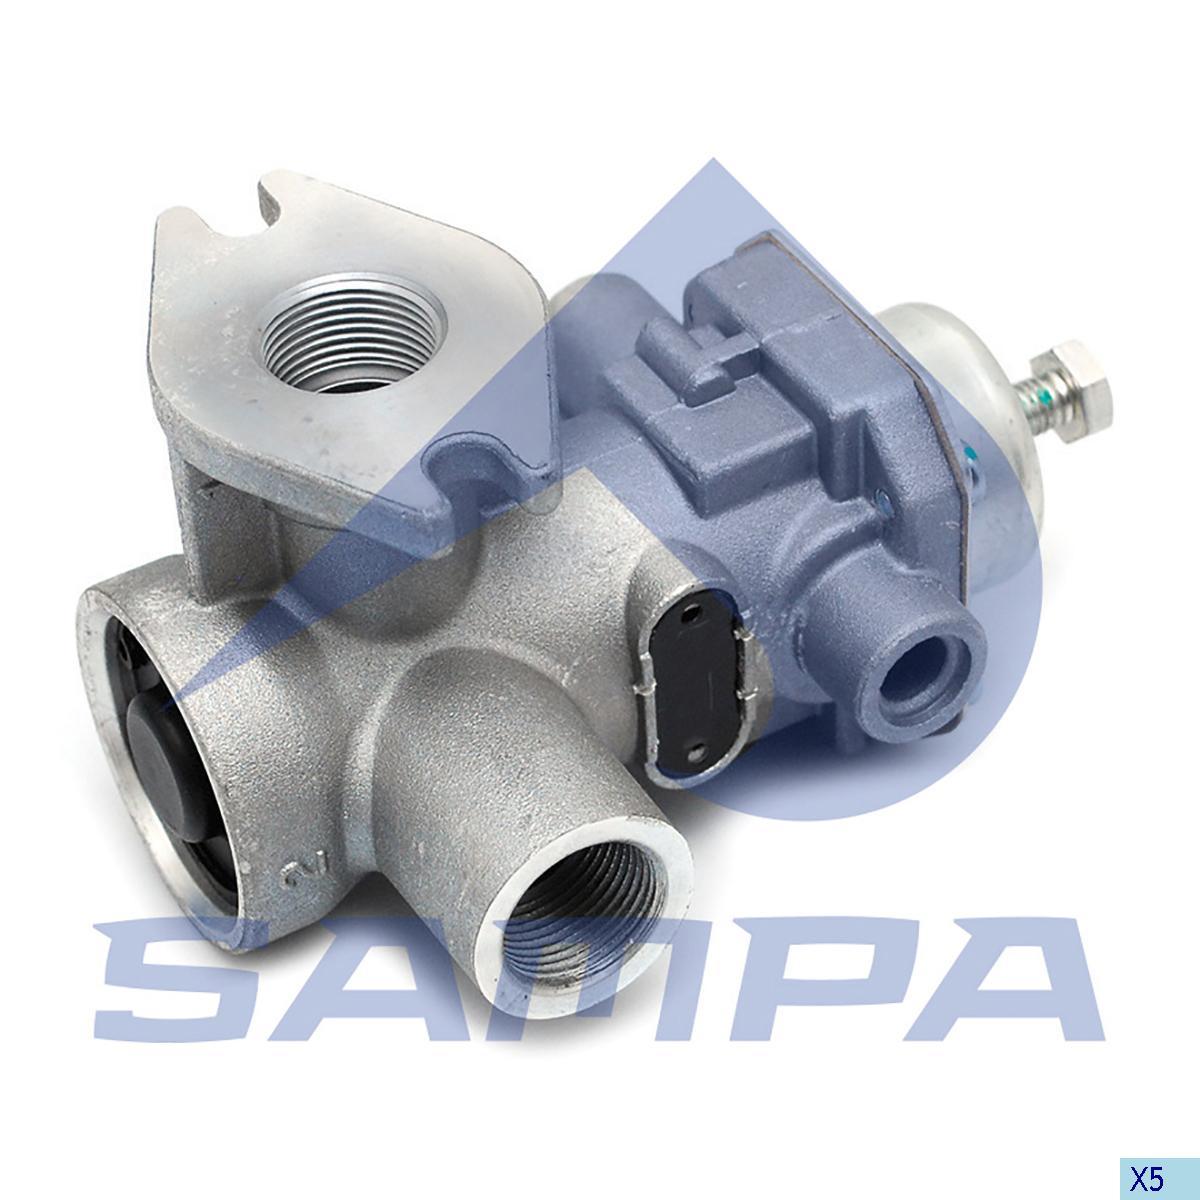 Pressure Control Valve, Mercedes, Compressed Air System